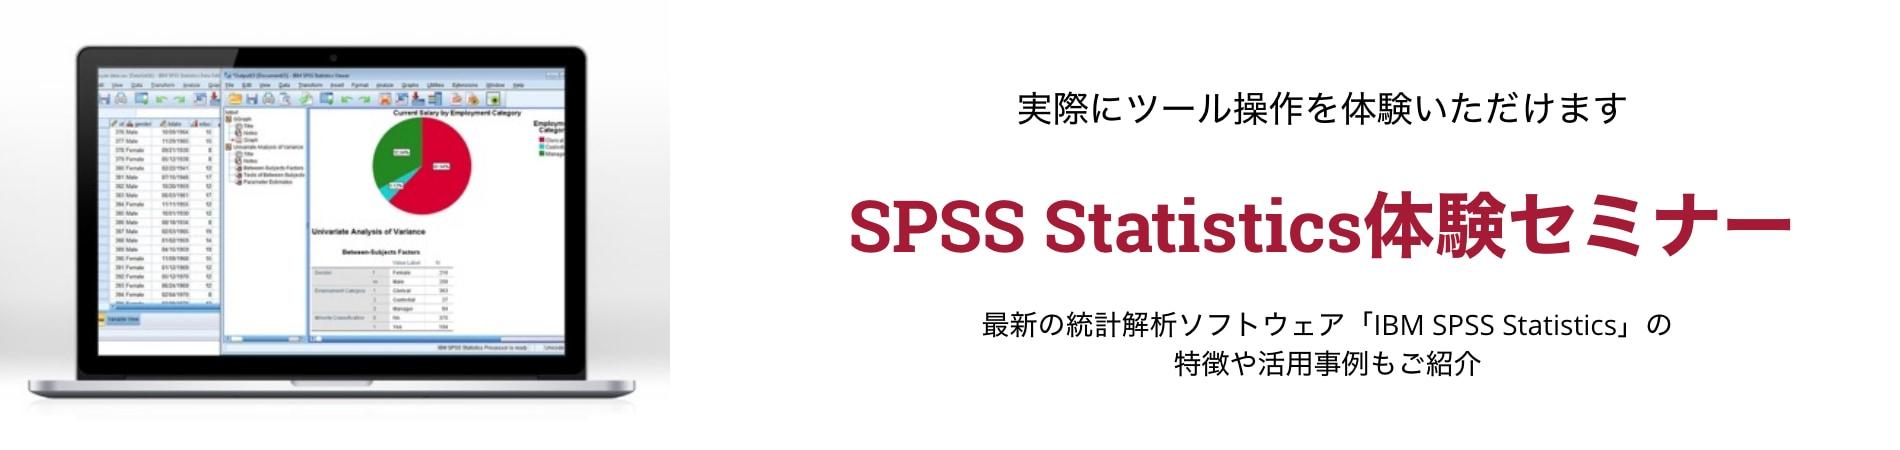 SPSS Statistics体験セミナー